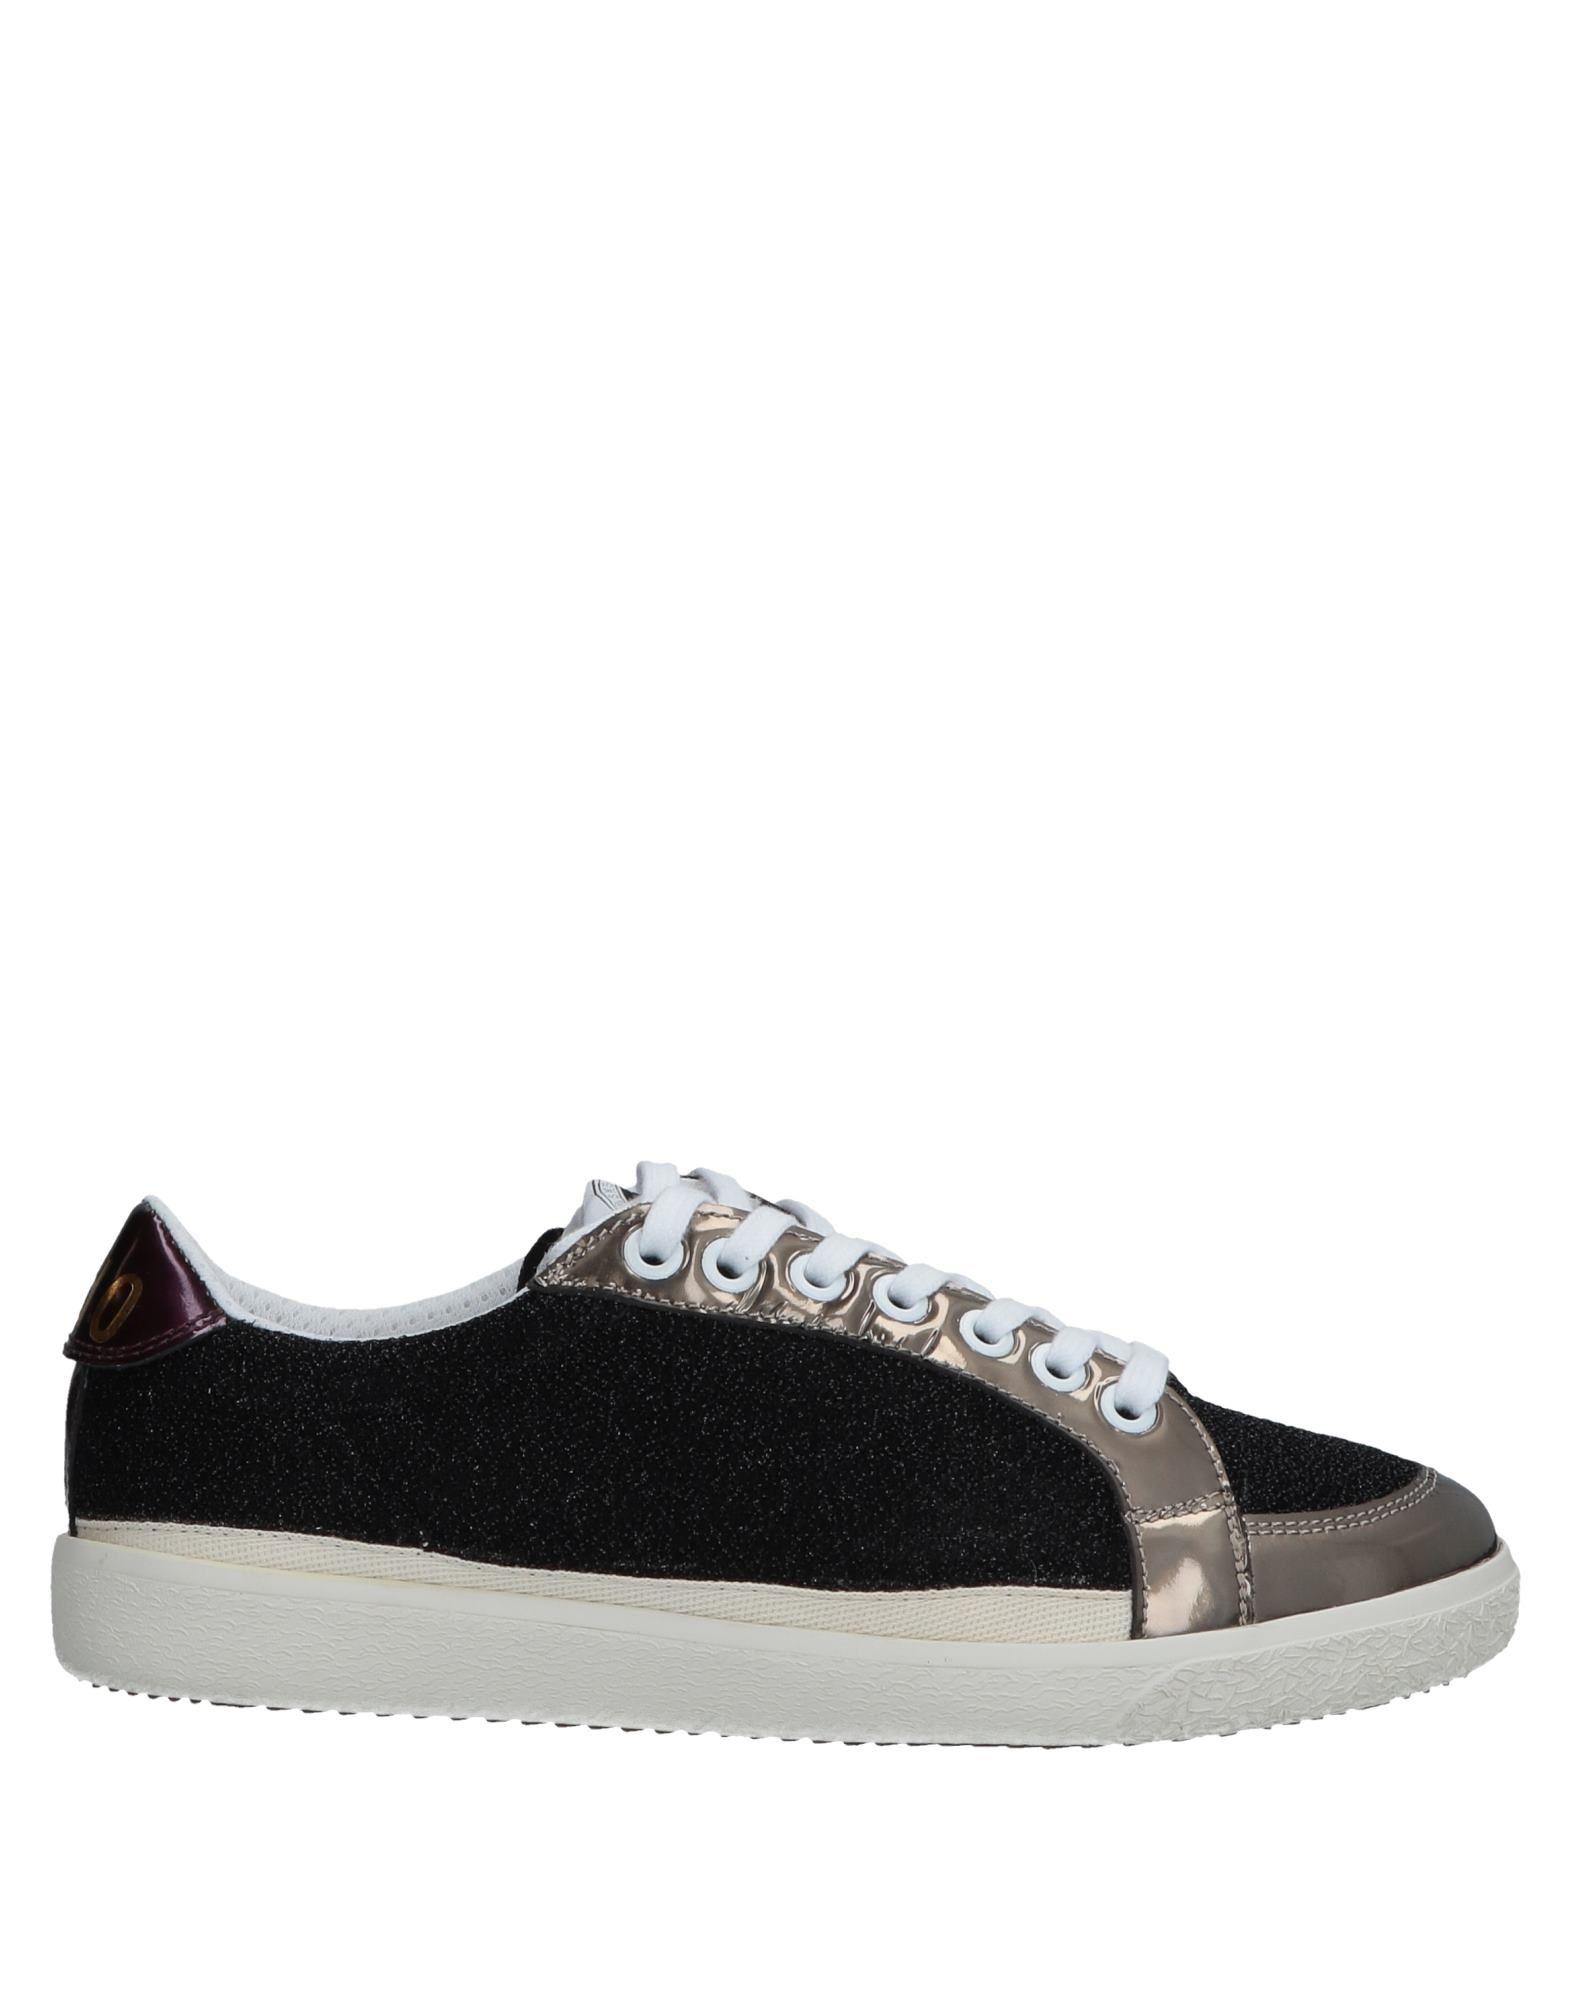 Pantofola D'oro Sneakers Sneakers - Women Pantofola D'oro Sneakers Sneakers online on  United Kingdom - 11569615RO 75c901